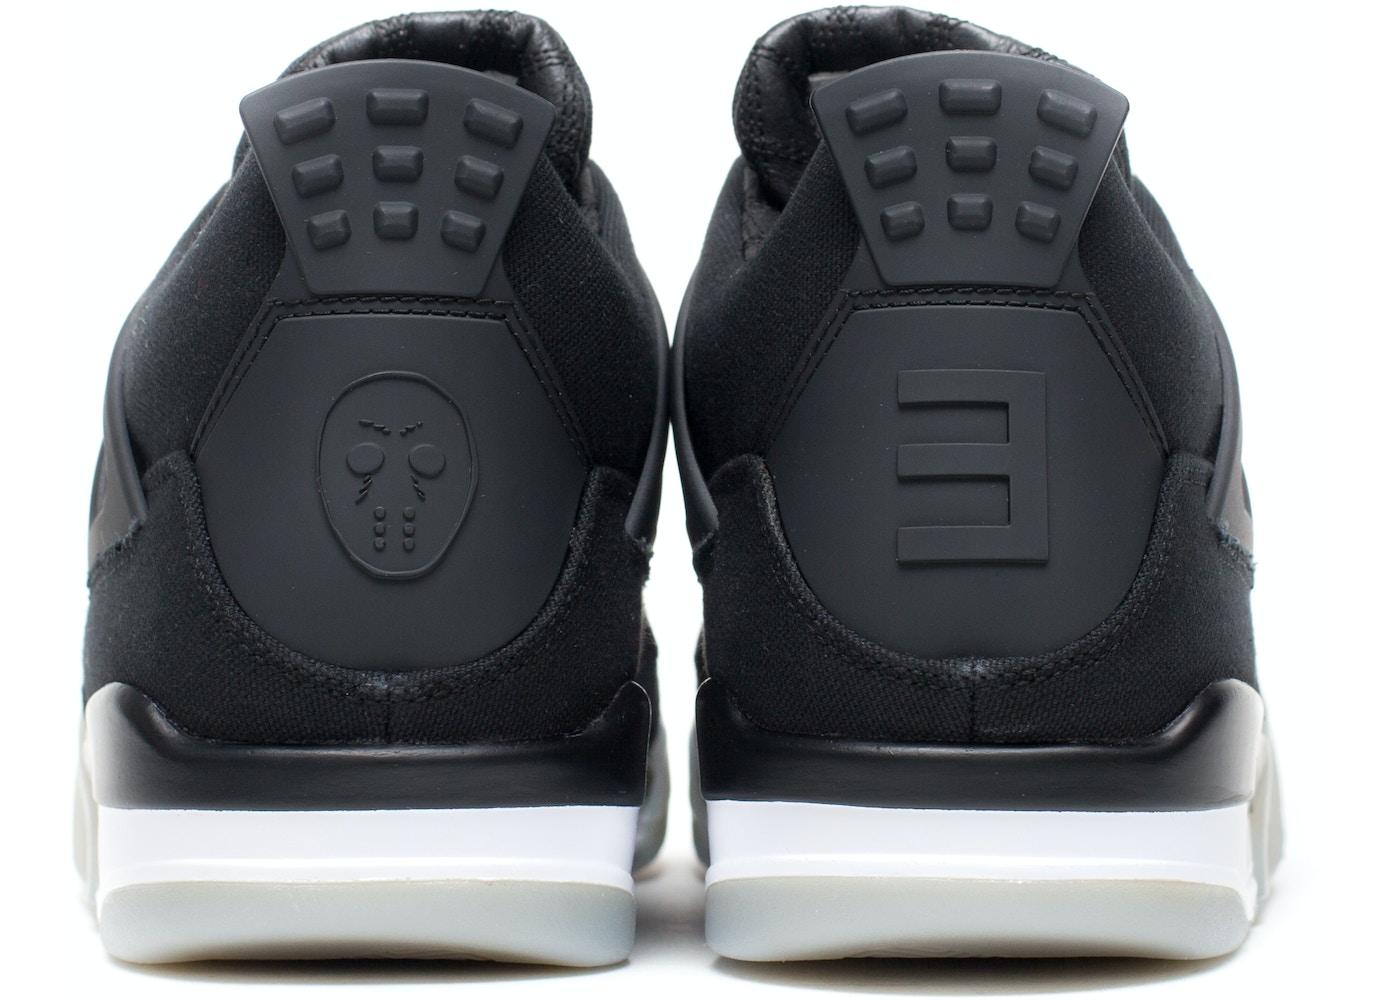 online retailer f3ada 539ec Jordan 4 Retro Eminem Carhartt Signed Box (sz 10.5)